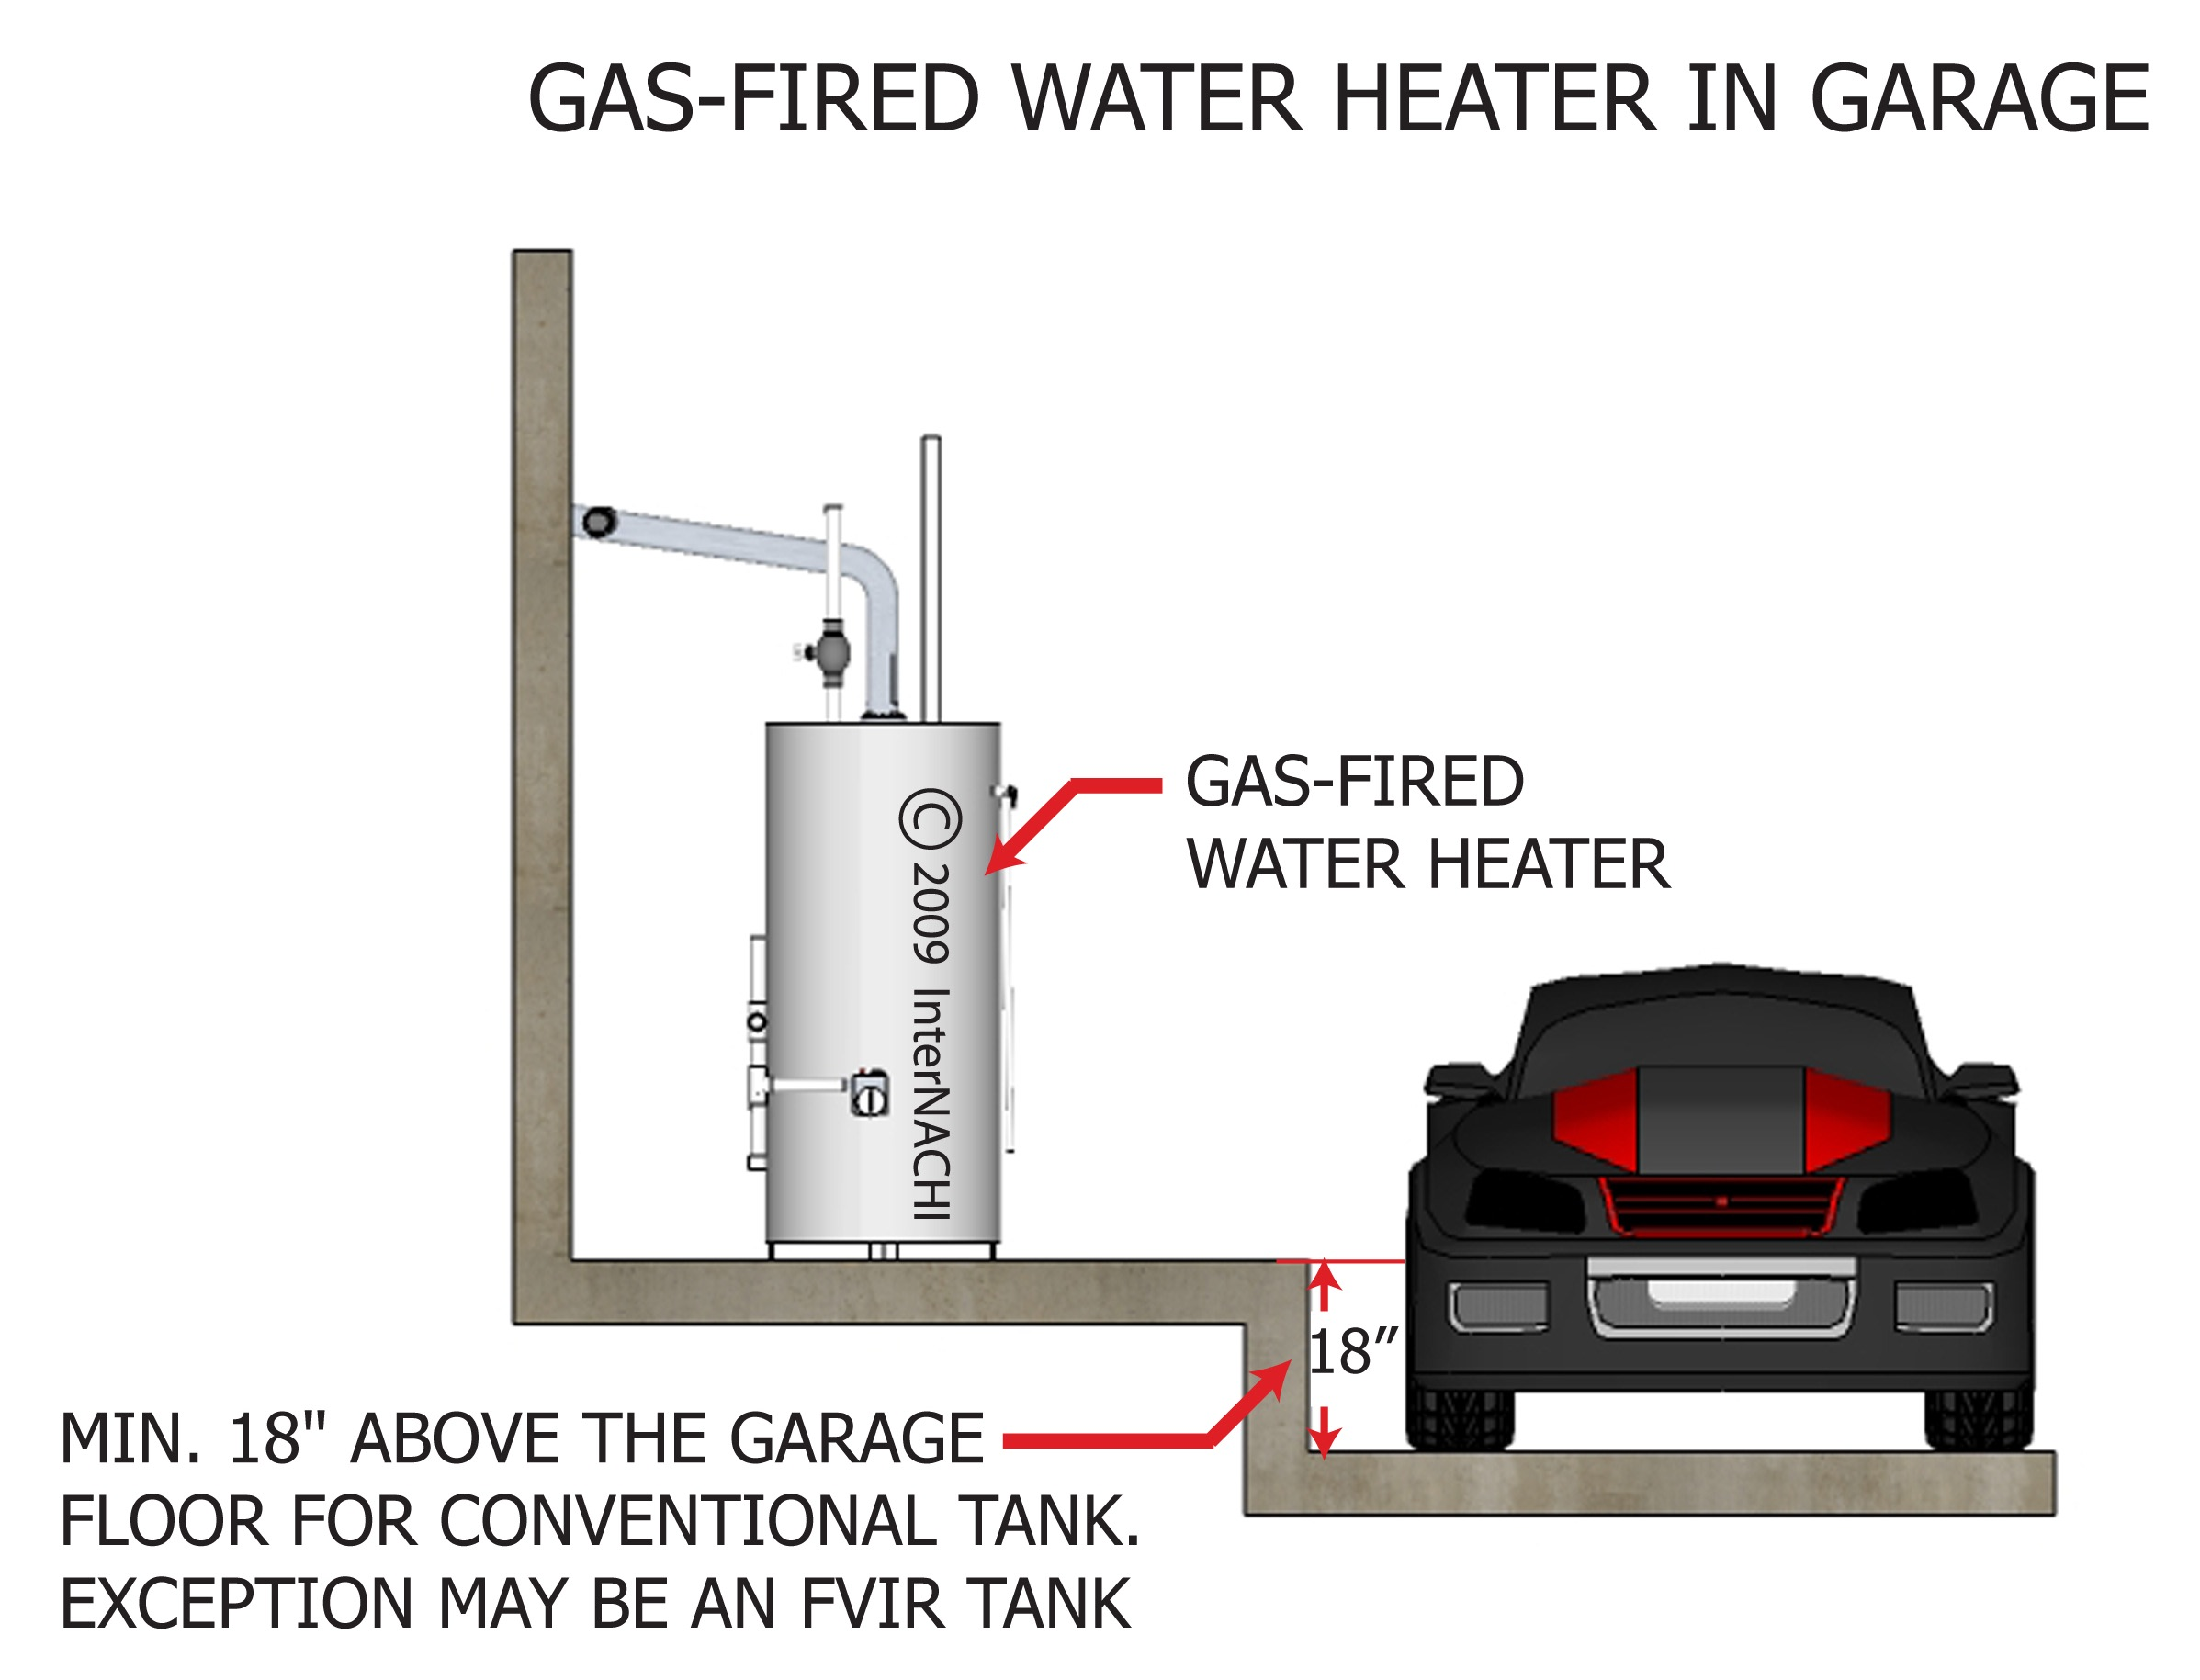 heater designs interior heaters fireplace procom btu gas ideas for garage decorating best on